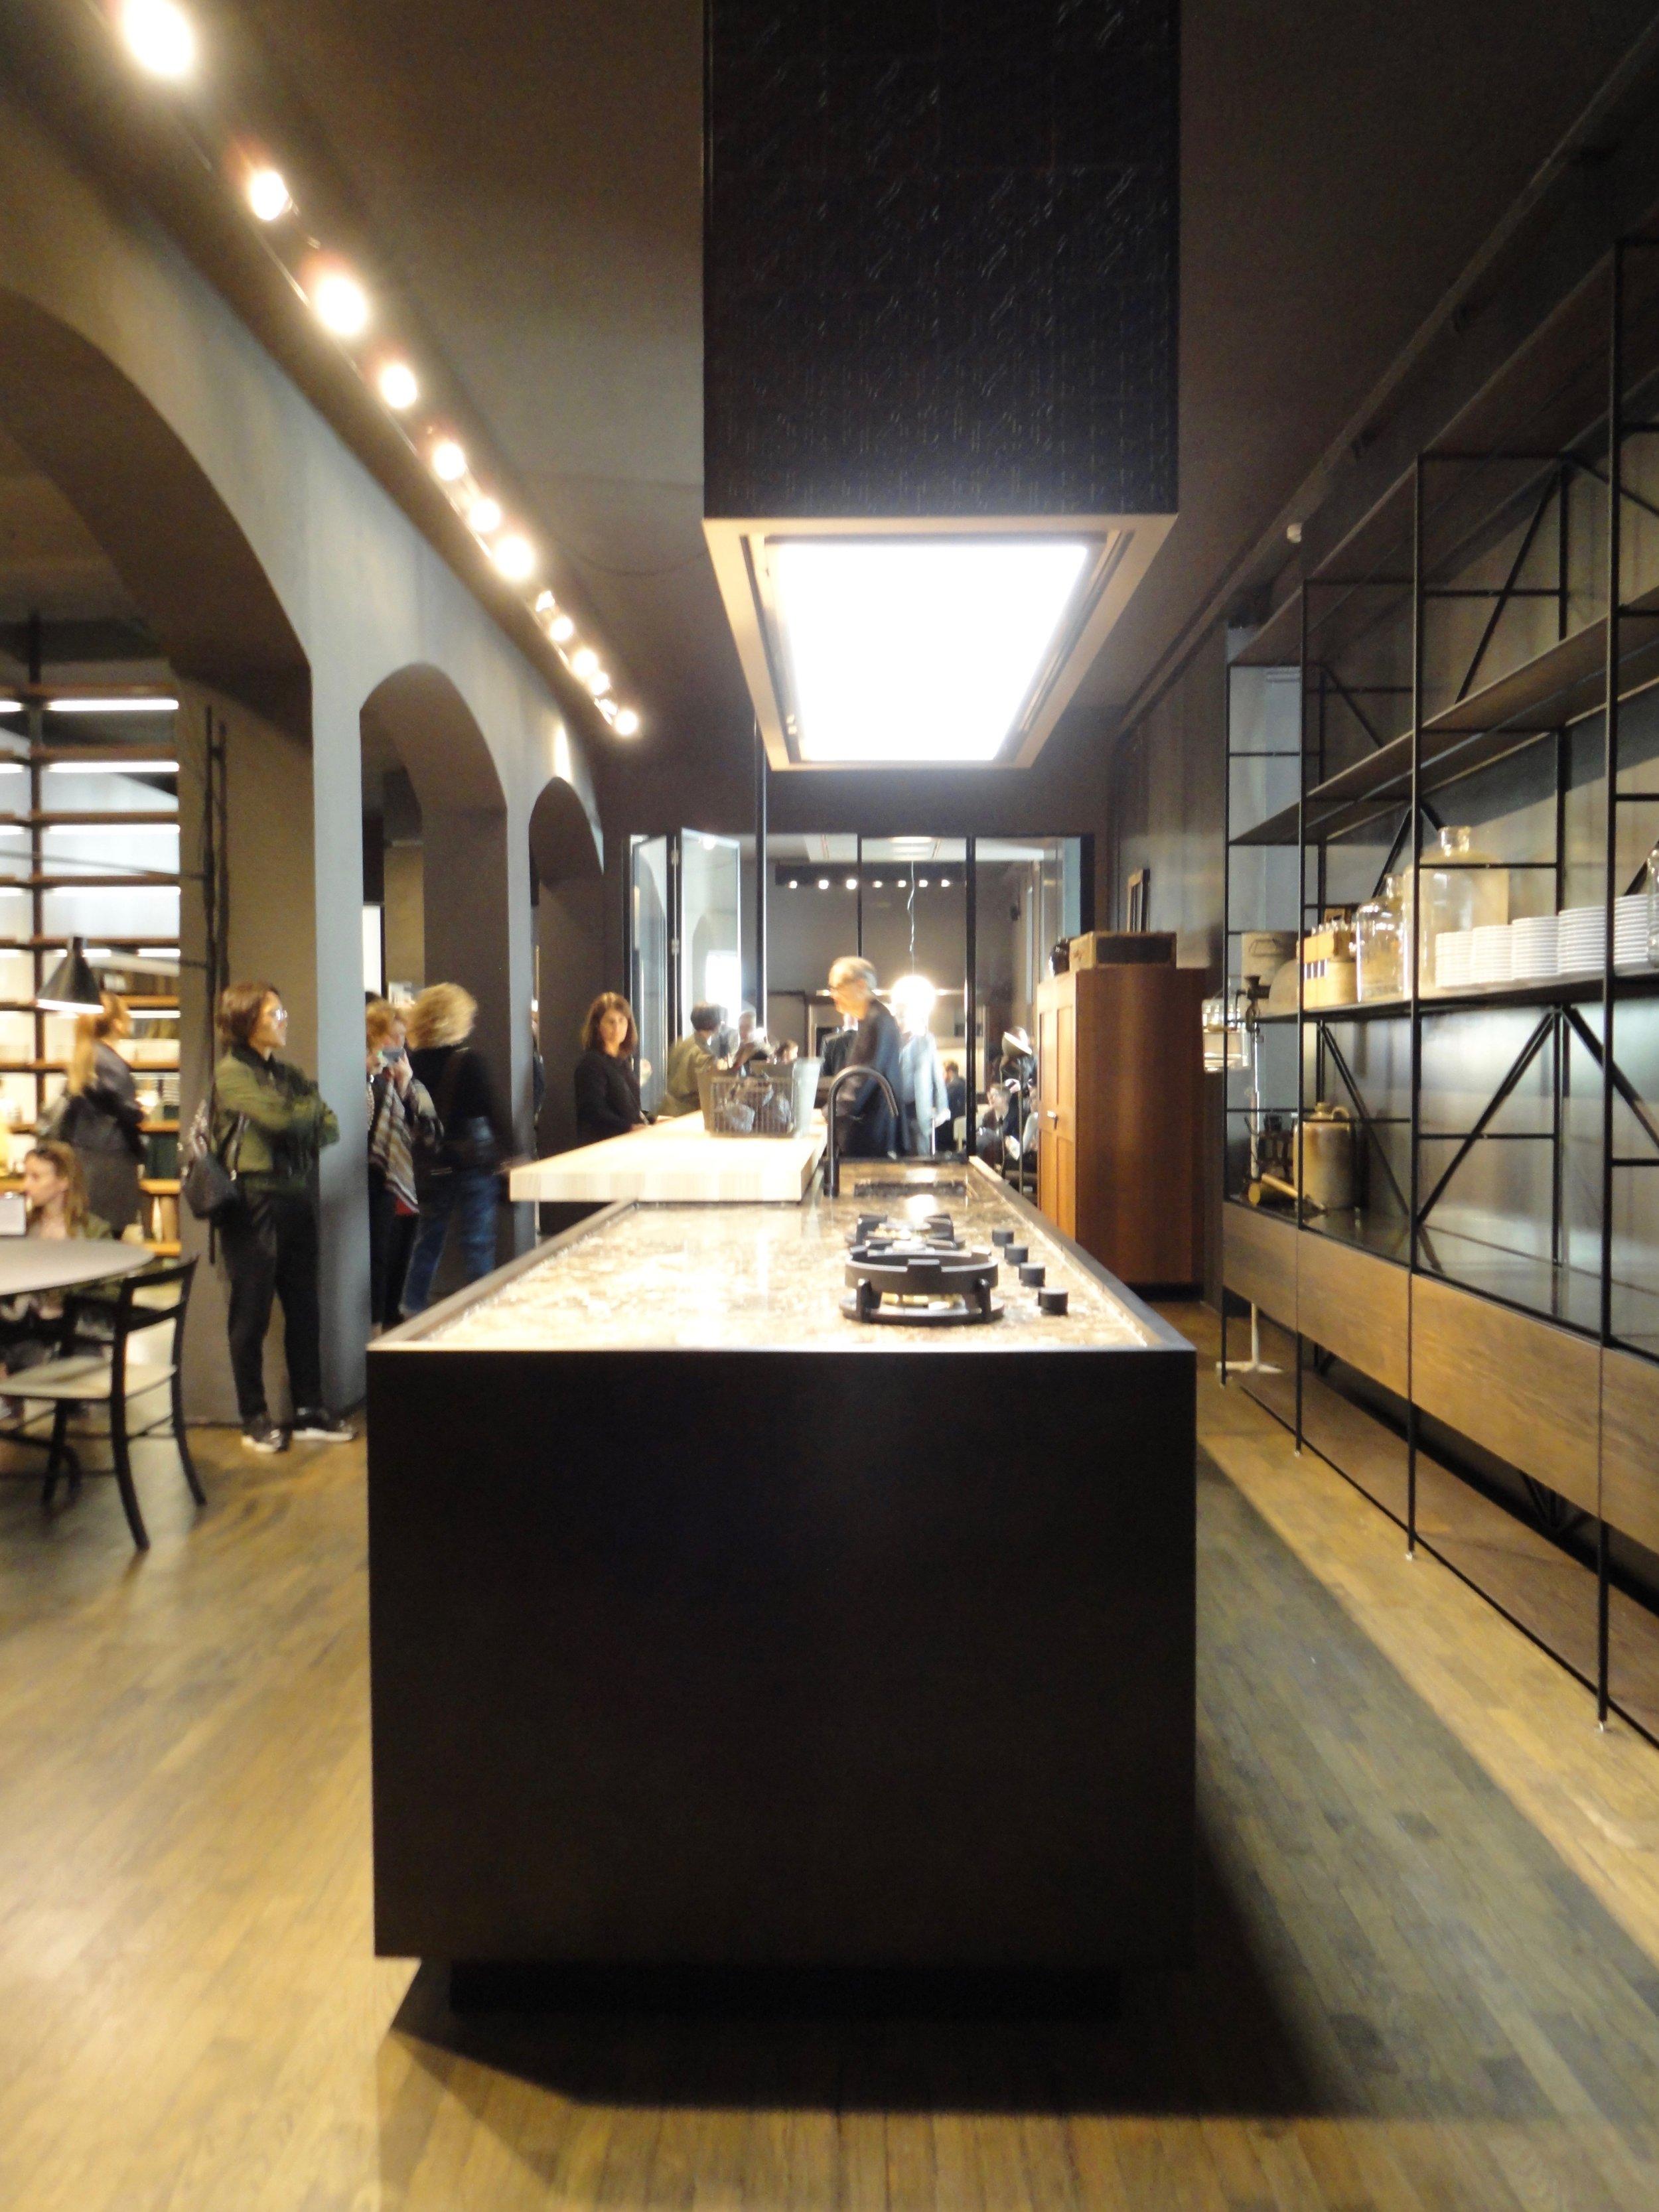 A furniture-like kitchen design at Boffi